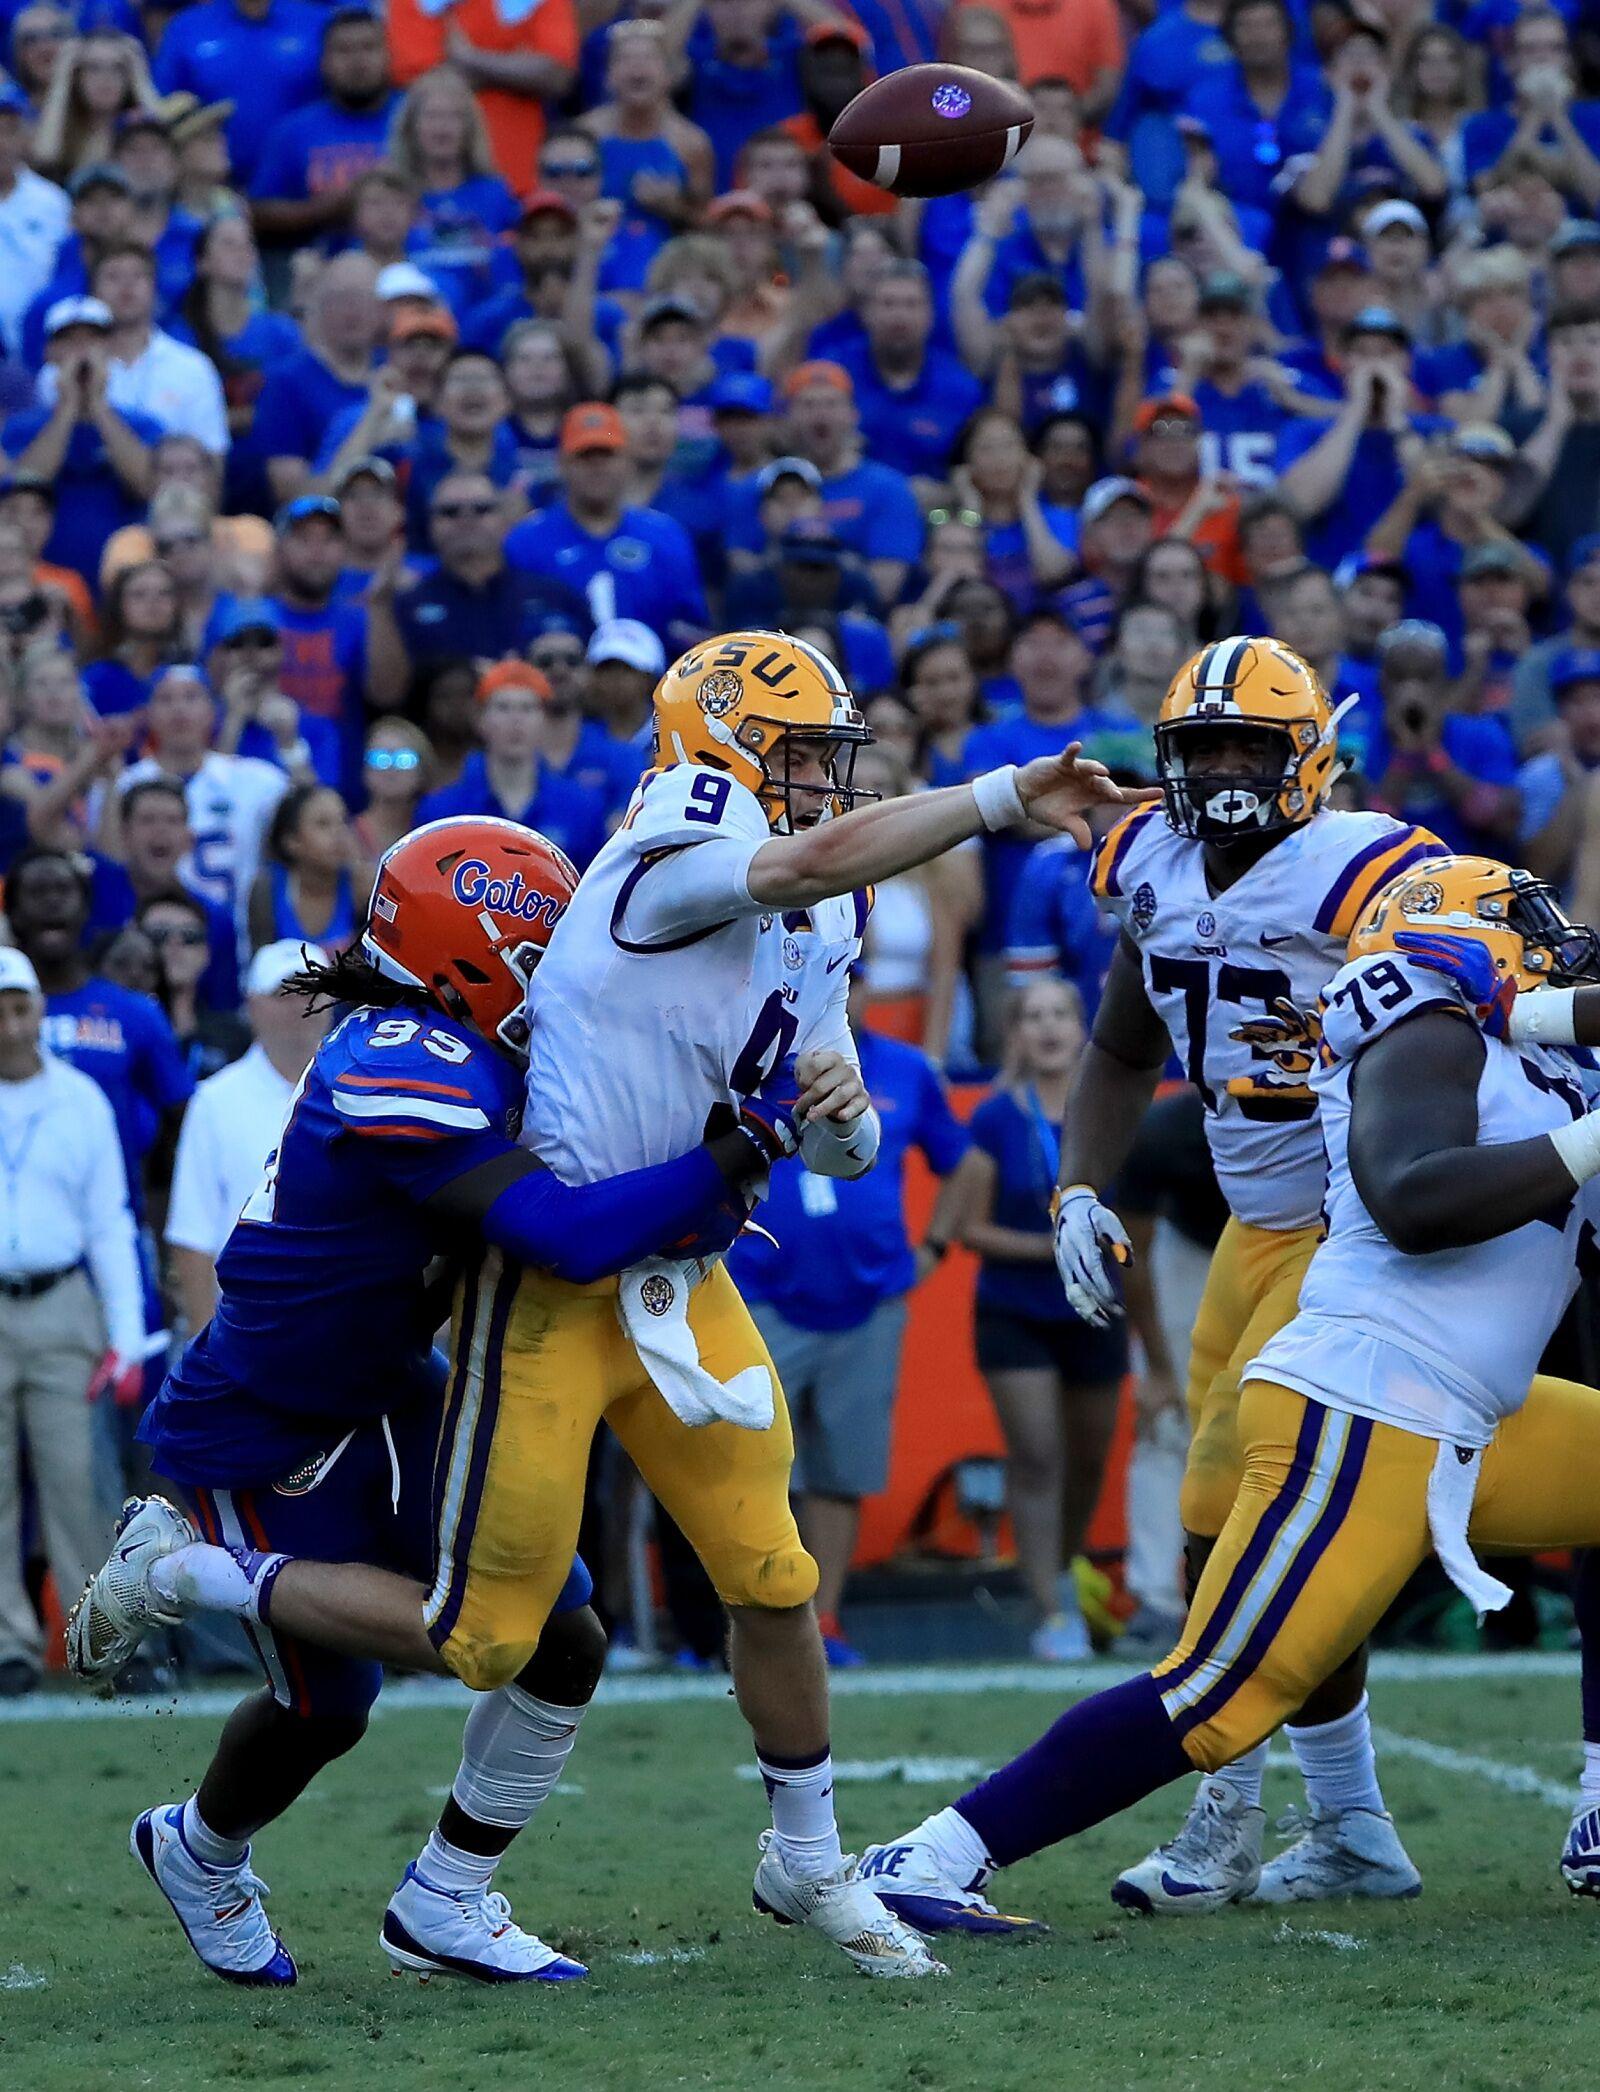 Florida Football: Gators fans honored among SEC's best in Fandom250